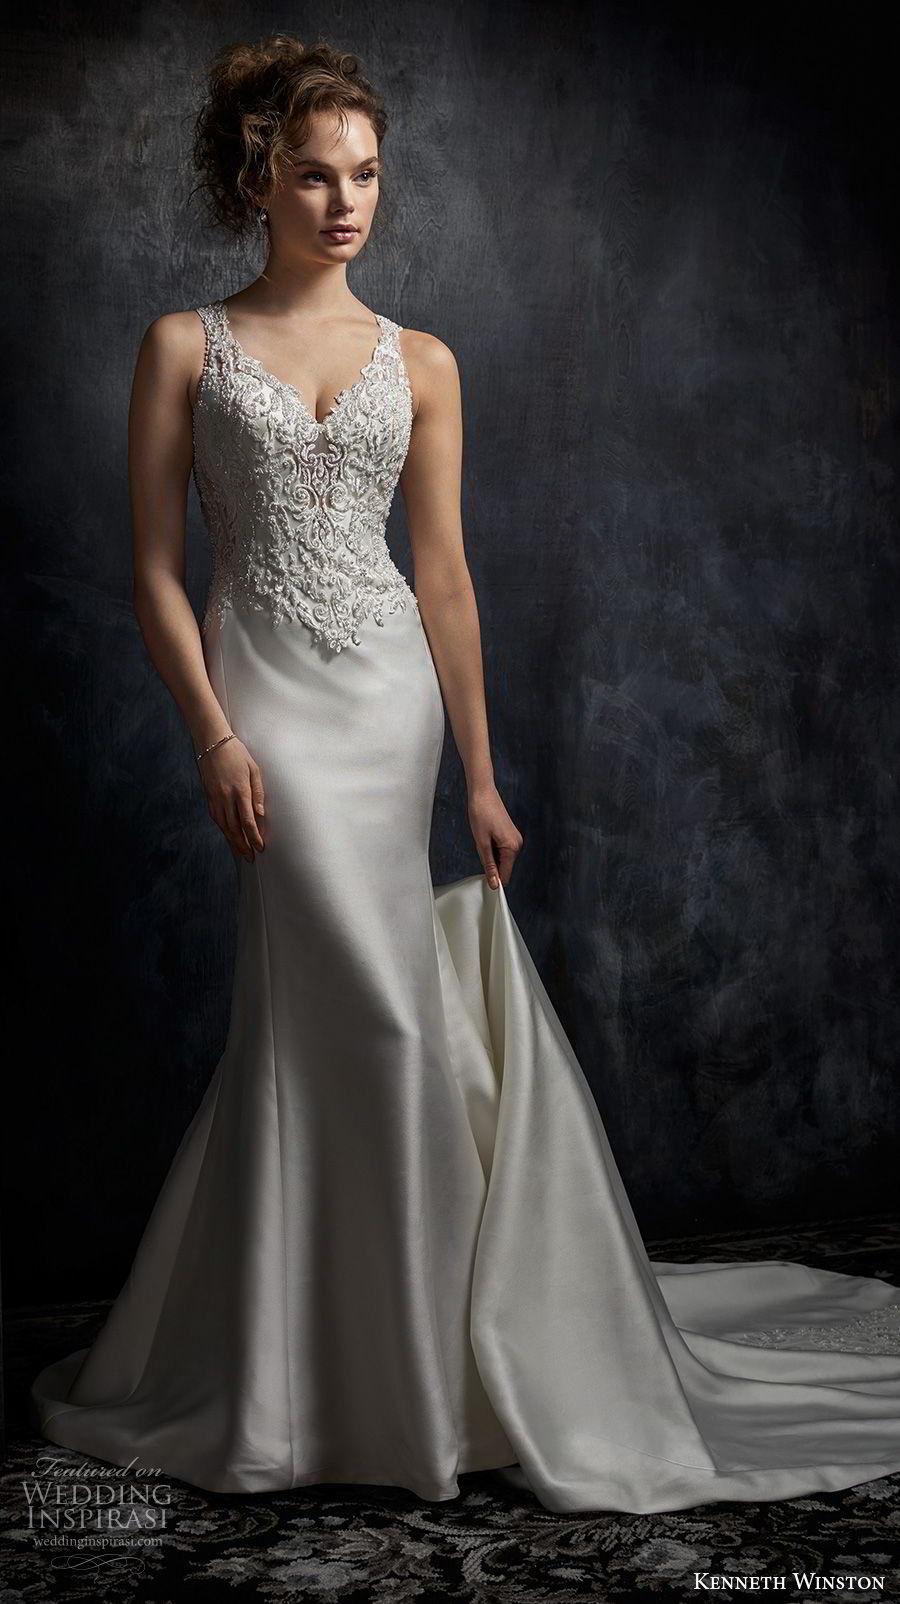 kenneth winston fall 2017 bridal sleeveless embroidered strap v neck heavily embellished bodice satin skirt elegant sheath wedding dress rasor back medium train (41) mv